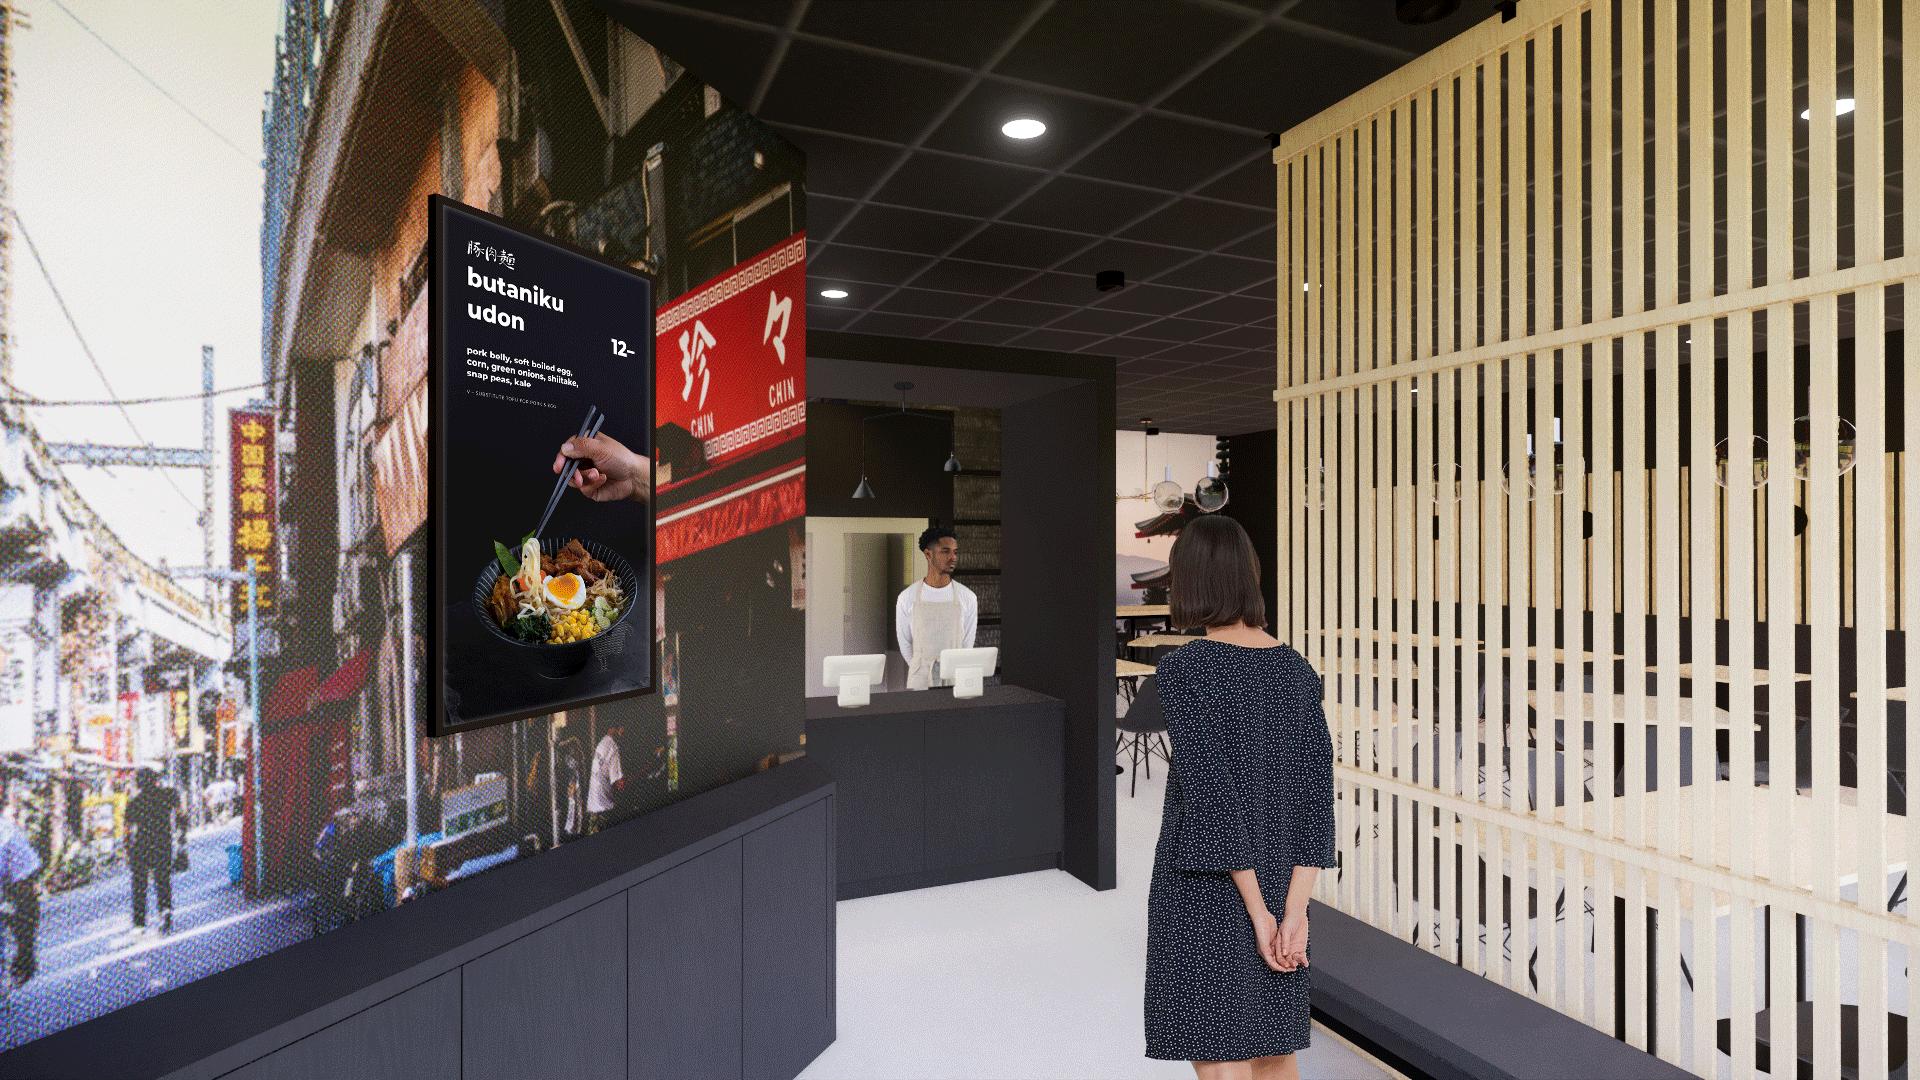 fusion-noodle-shop-order-counter.png